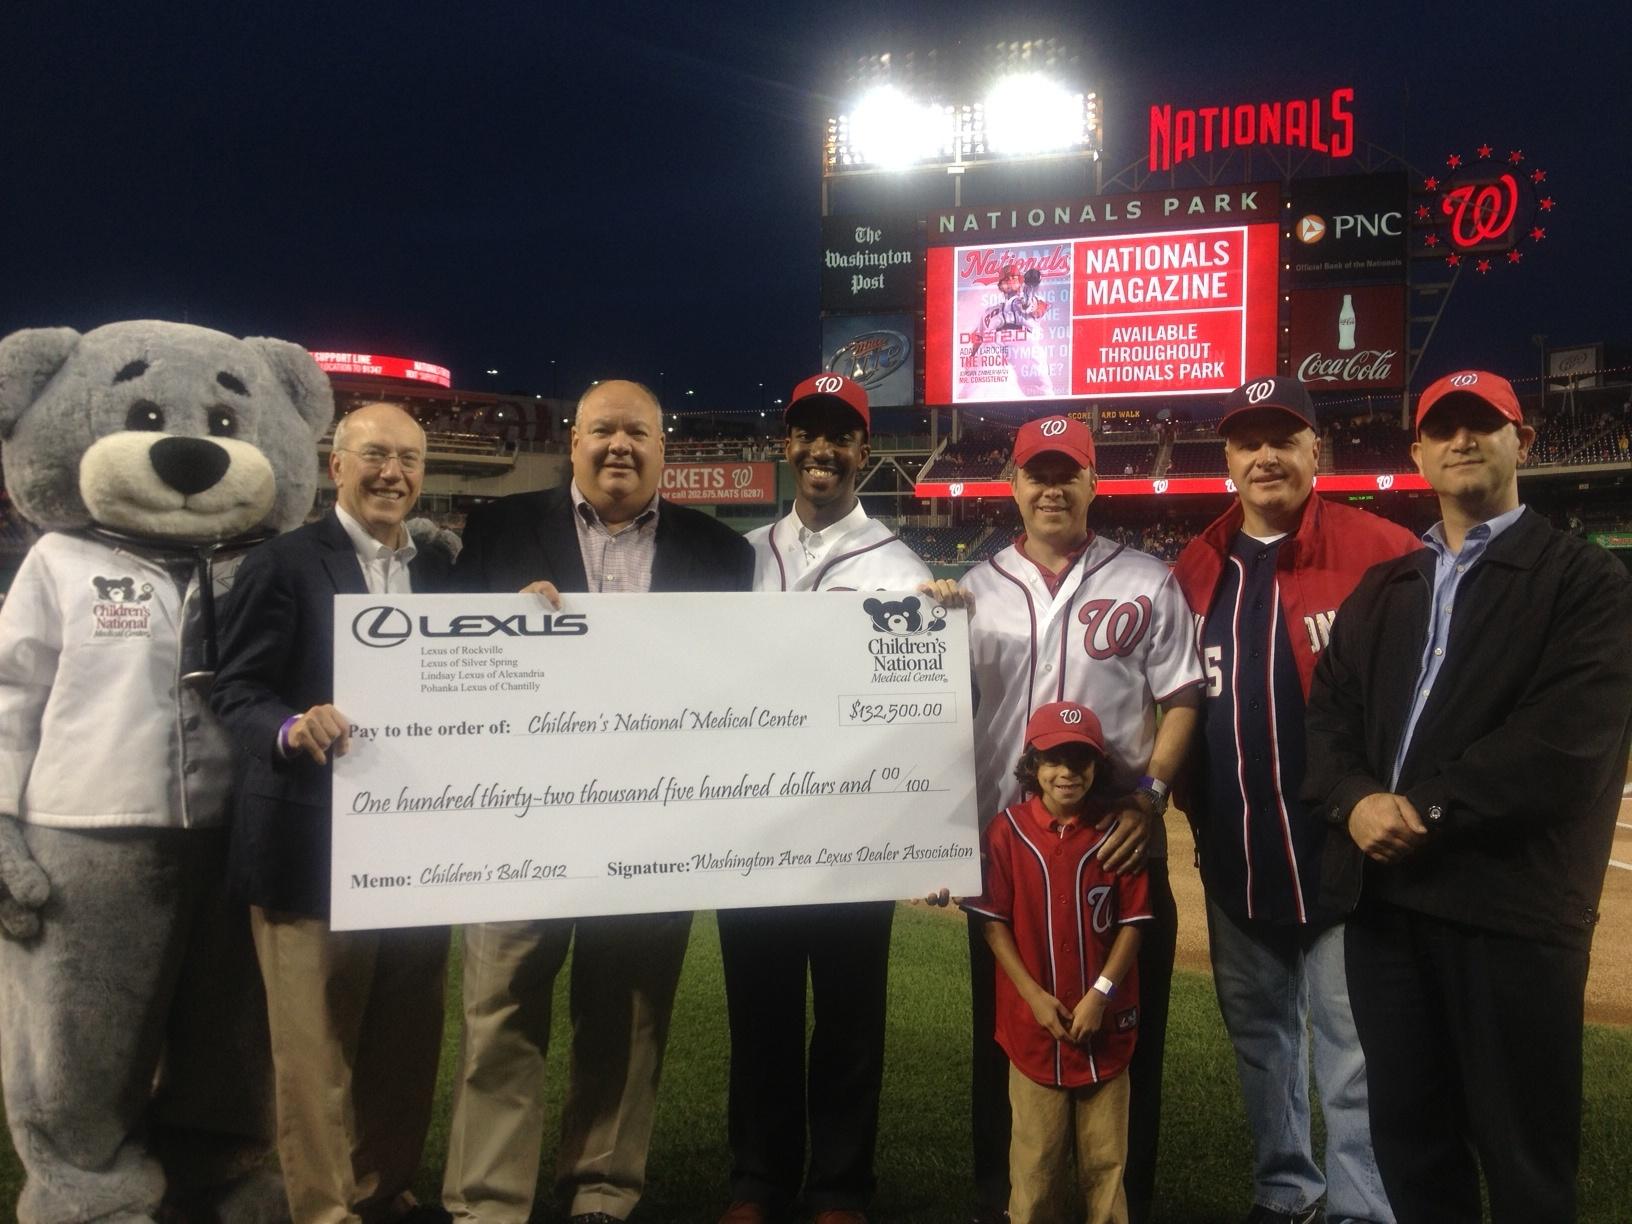 Washington Area Lexus Dealers Support Children s National Medical